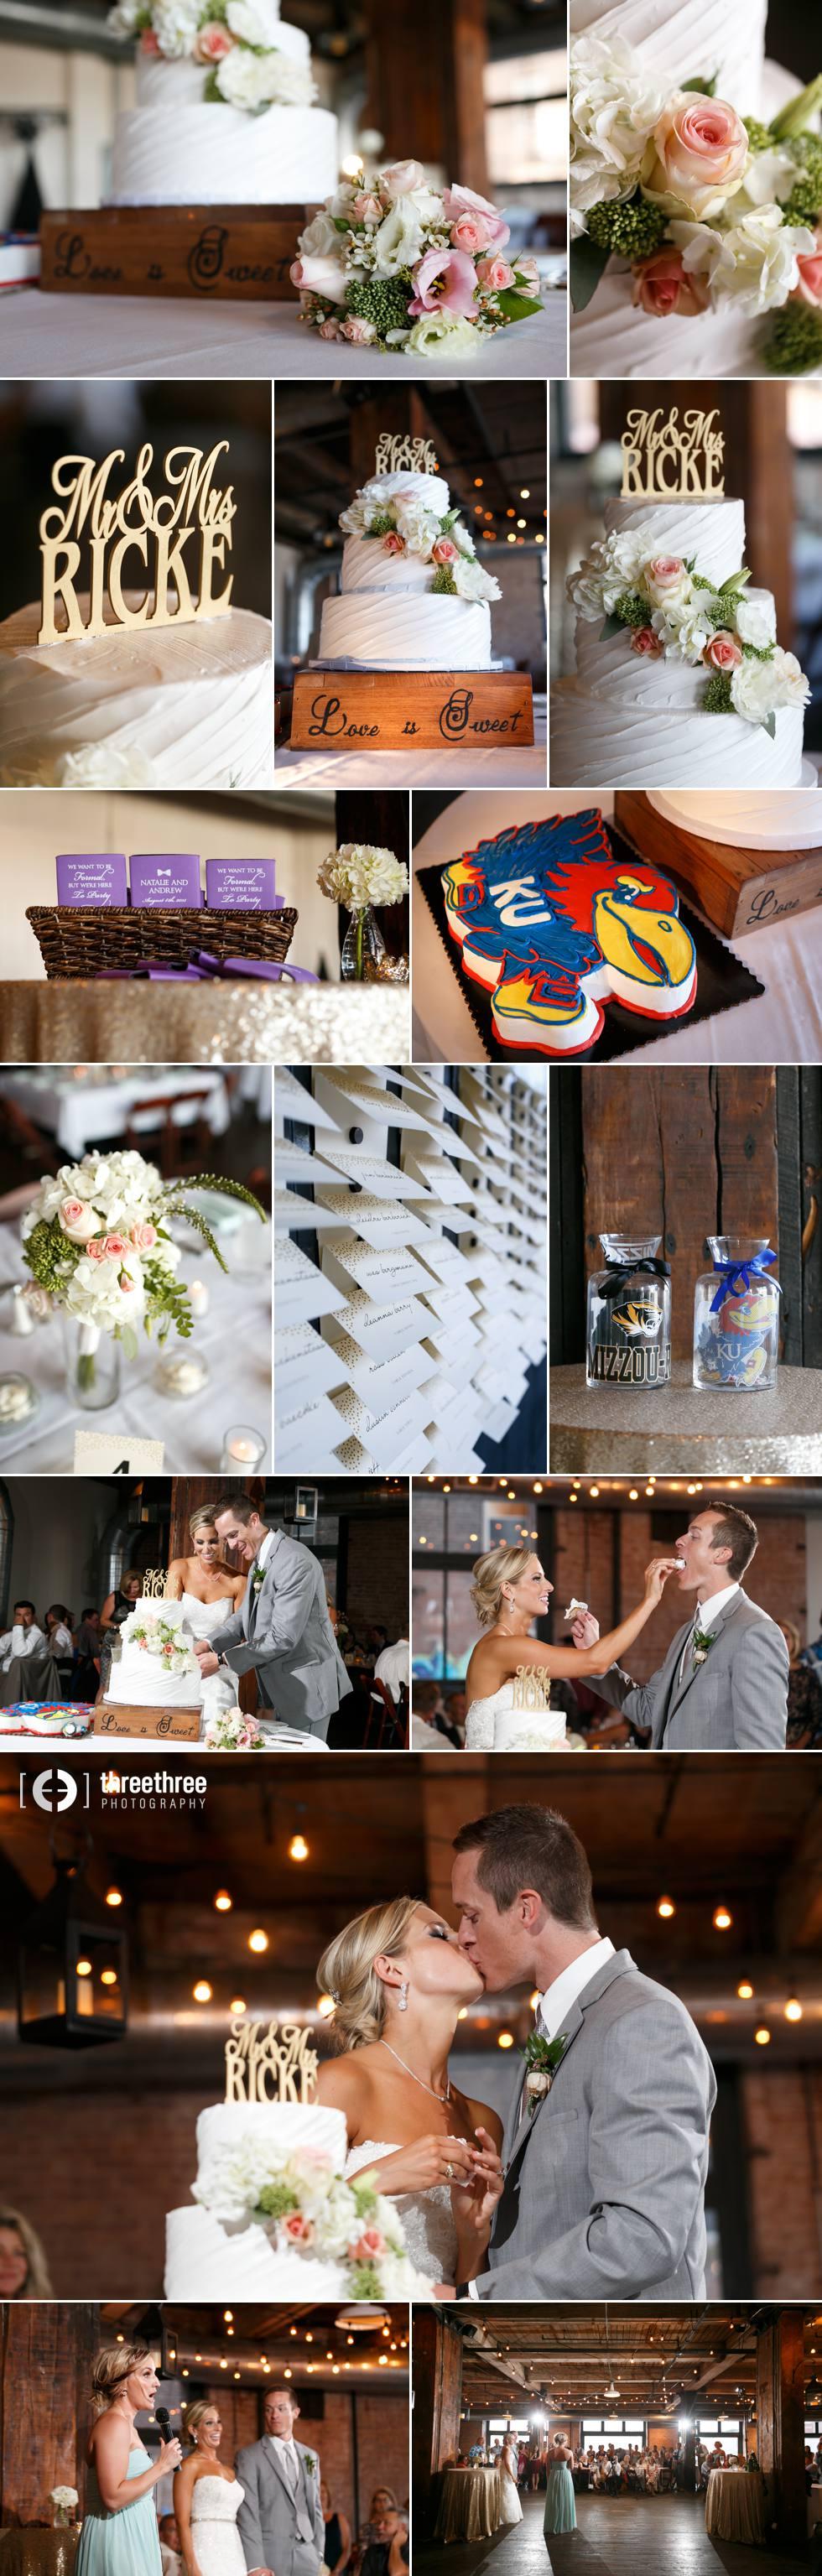 Natalie_AJ_wedding 14